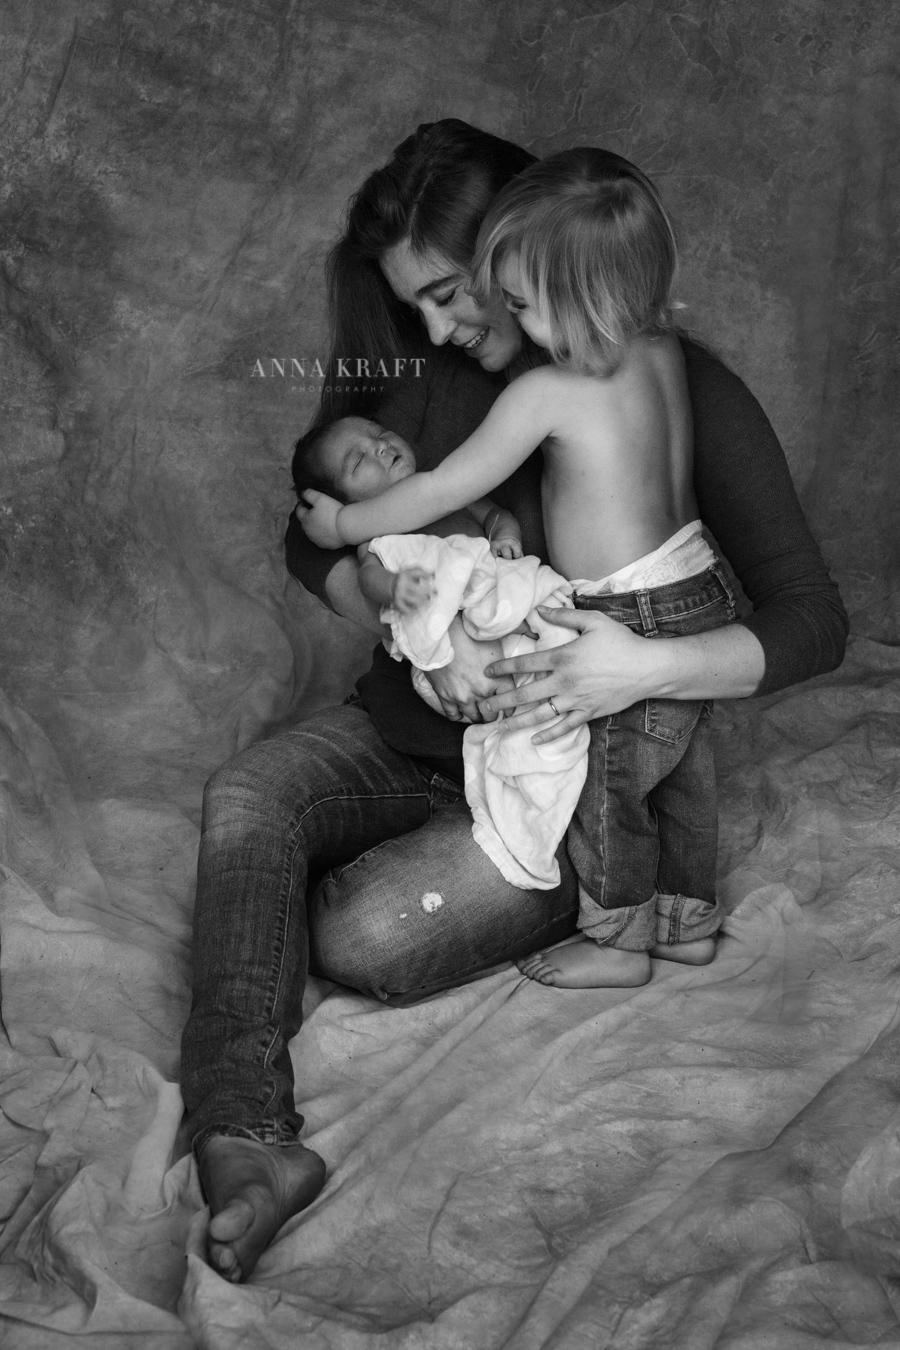 Joey, hospital, st. davids, newborn, baby, family, portrait, backdrop, infant, baby joey